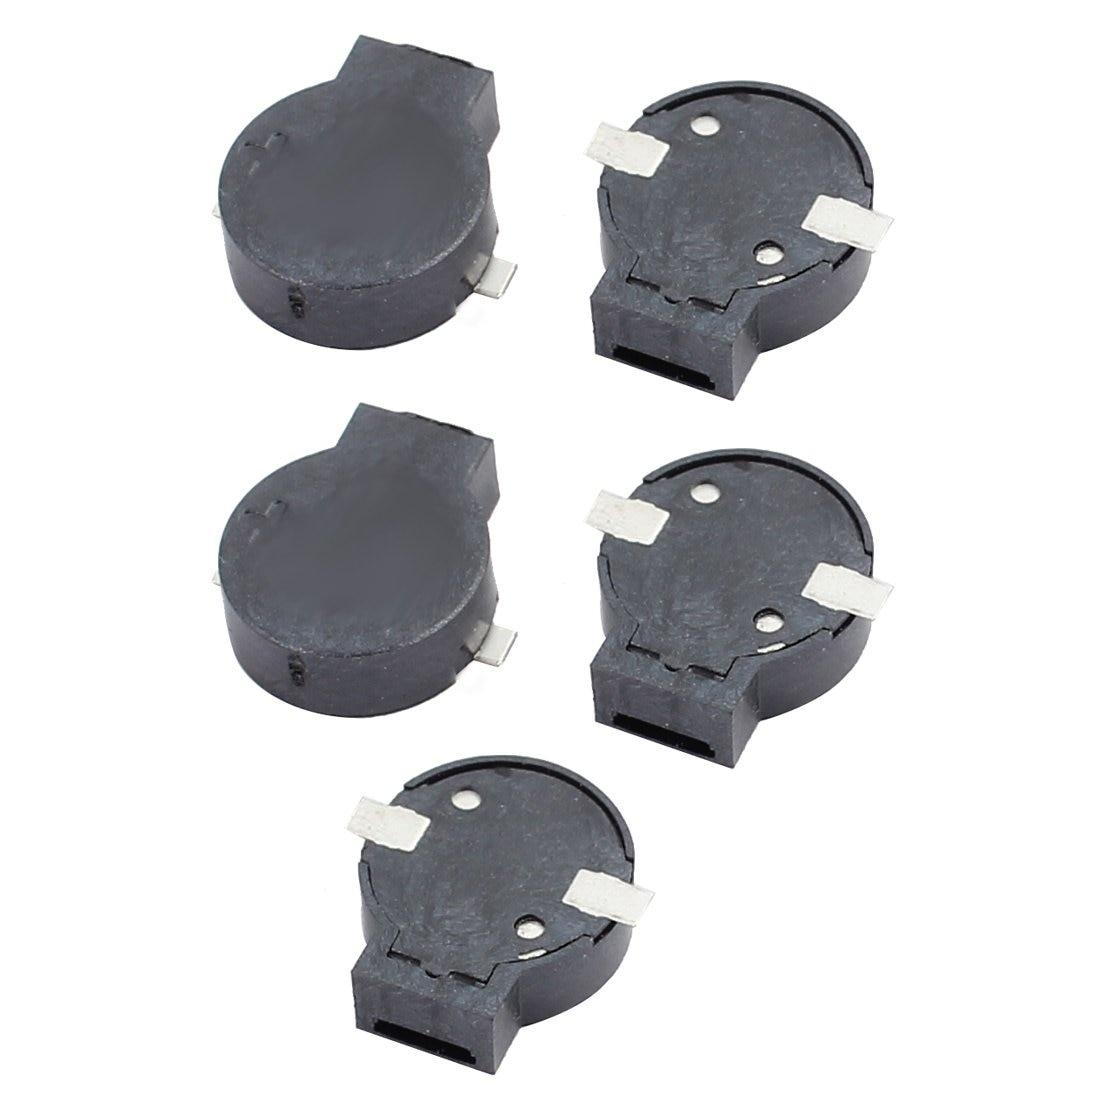 10 pçs/lote SMD 9032 9.0x3.2 MILÍMETROS Passive Buzzer Magnético DC 2 V-4 V Anti-lost altifalante Buzzer 9.0*3.2 MILÍMETROS Para Arduino Kit Electro